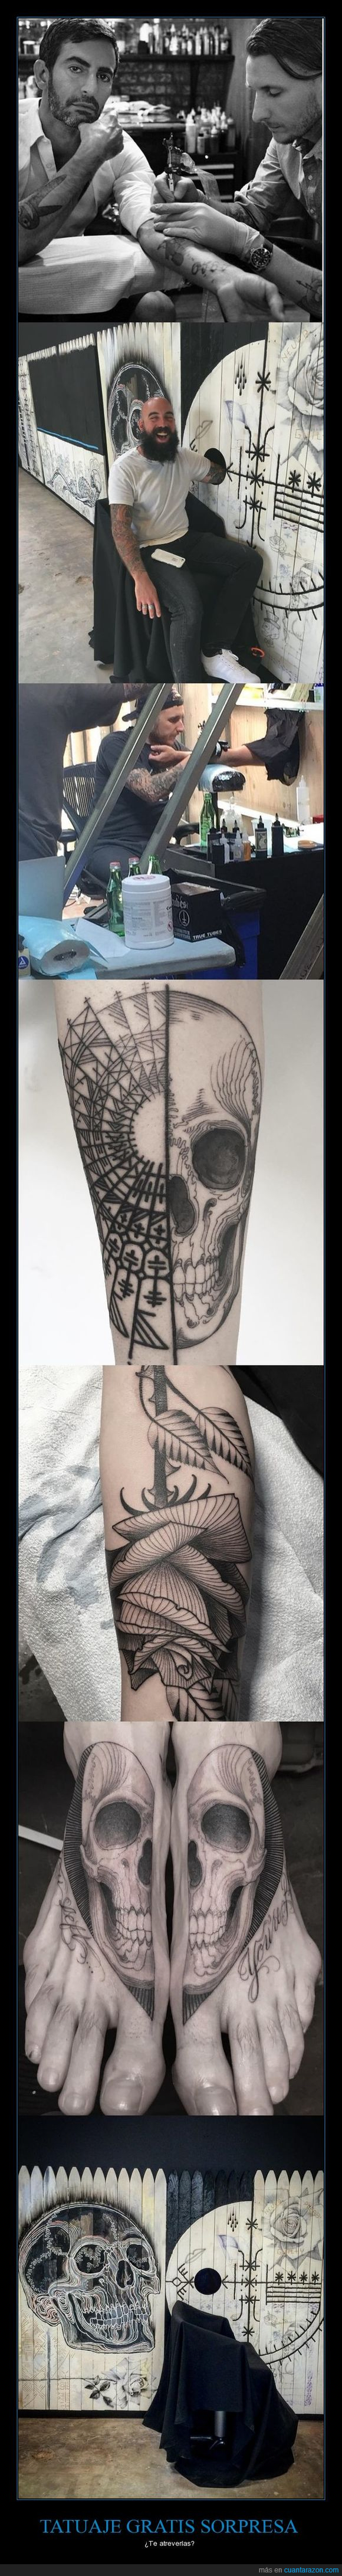 scott campbell,sorpresa,tatuaje